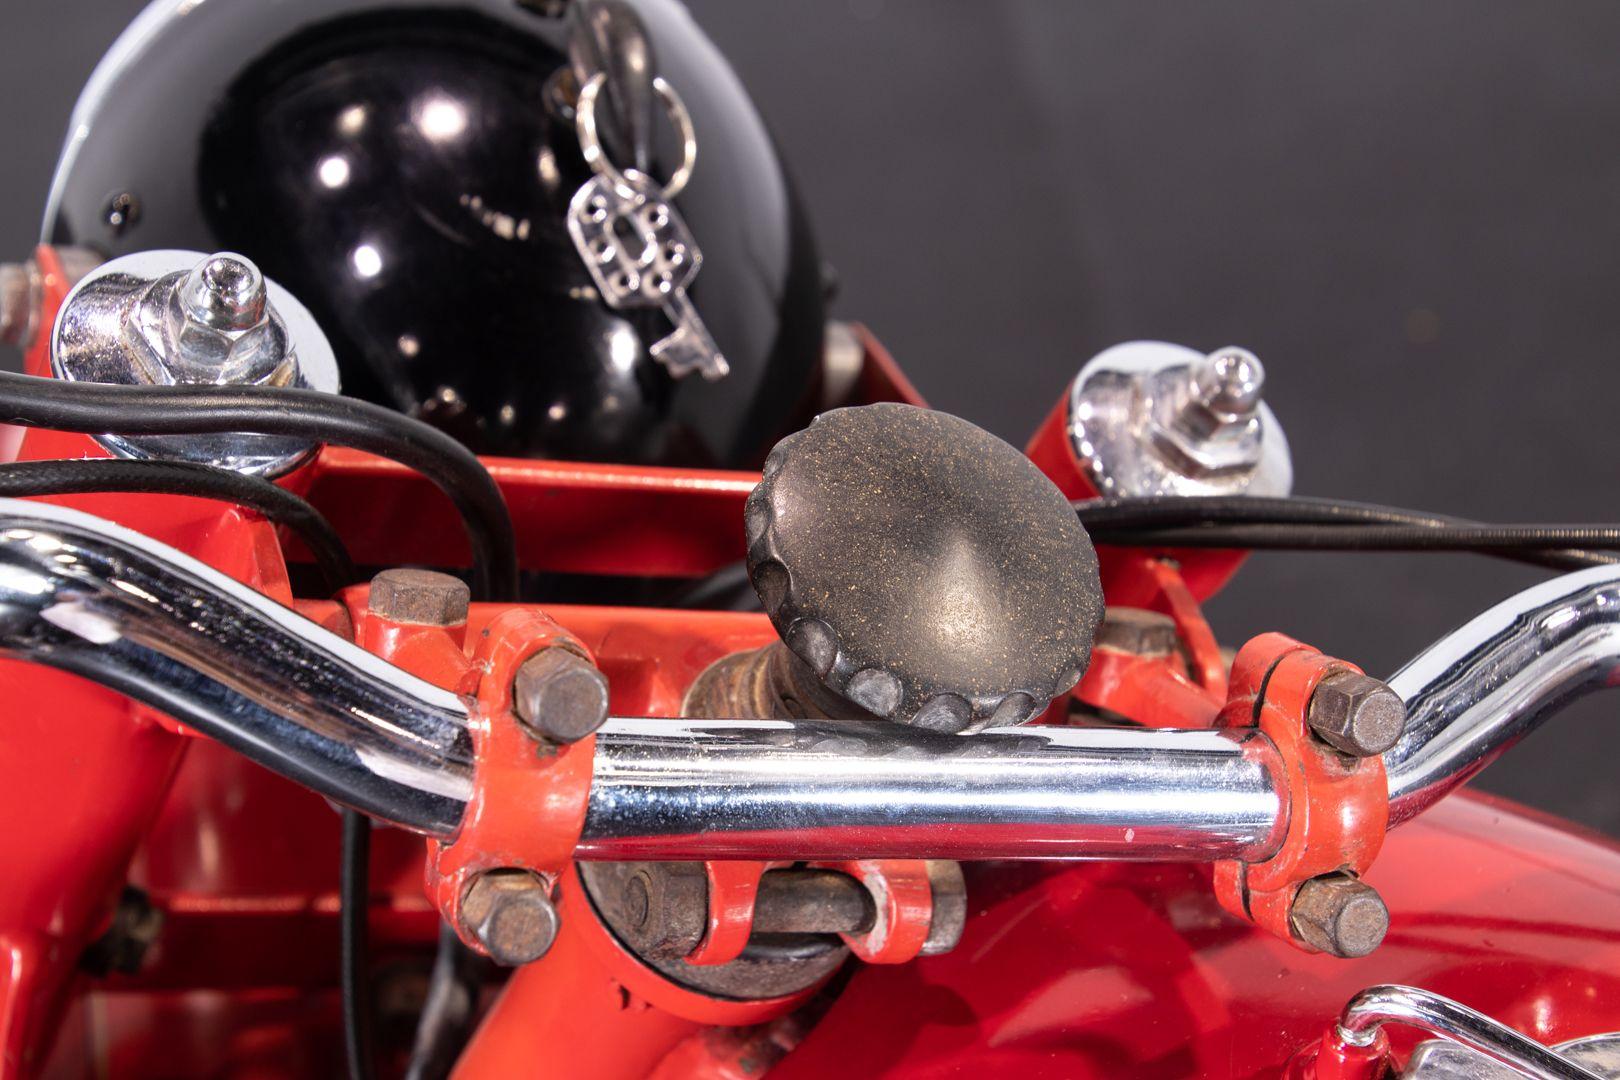 1954 Moto Guzzi Airone Sport 250 39121